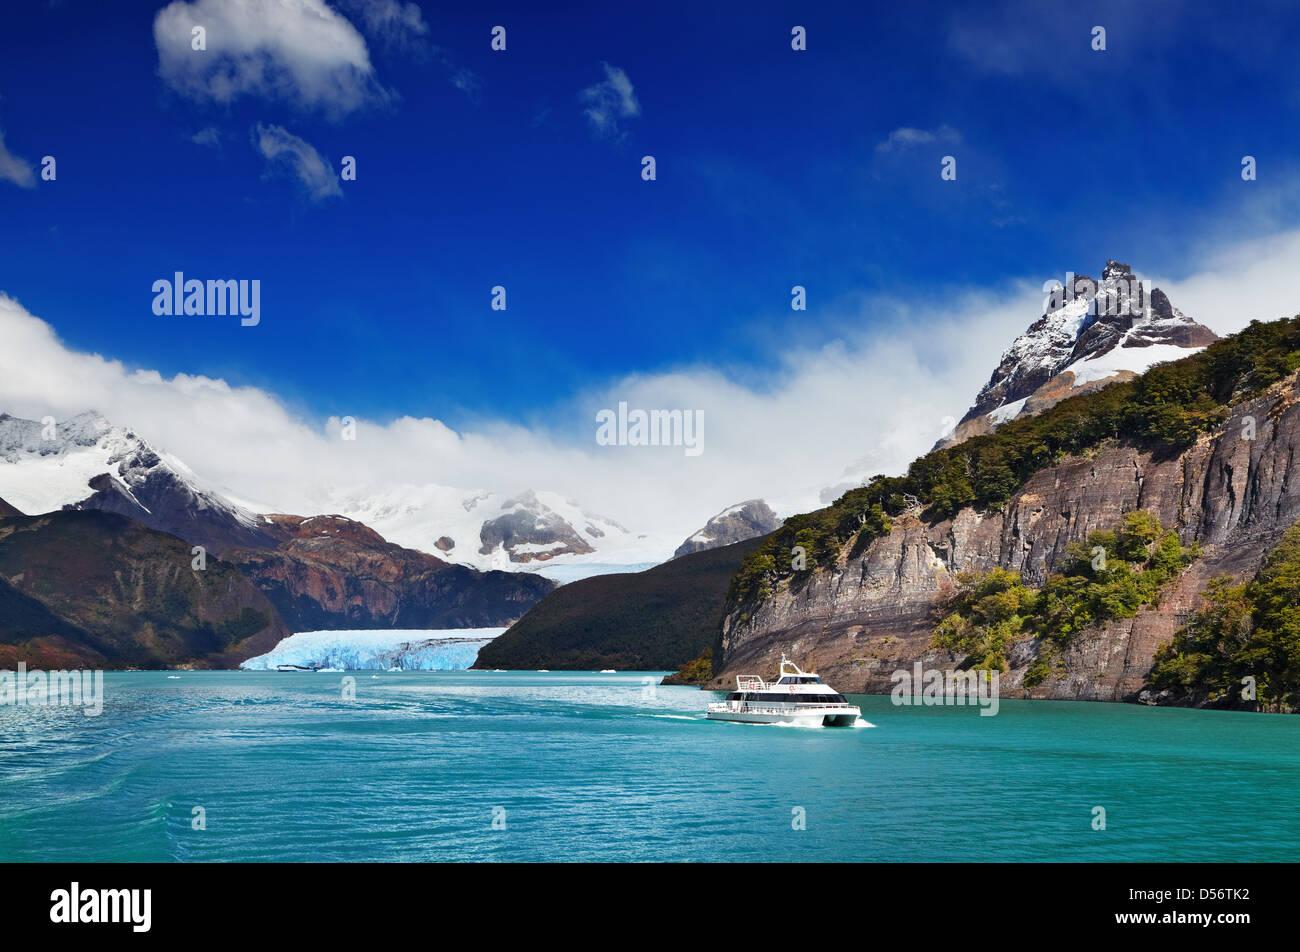 Spegazzini Glacier, Argentino Lake, Patagonia, Argentina - Stock Image